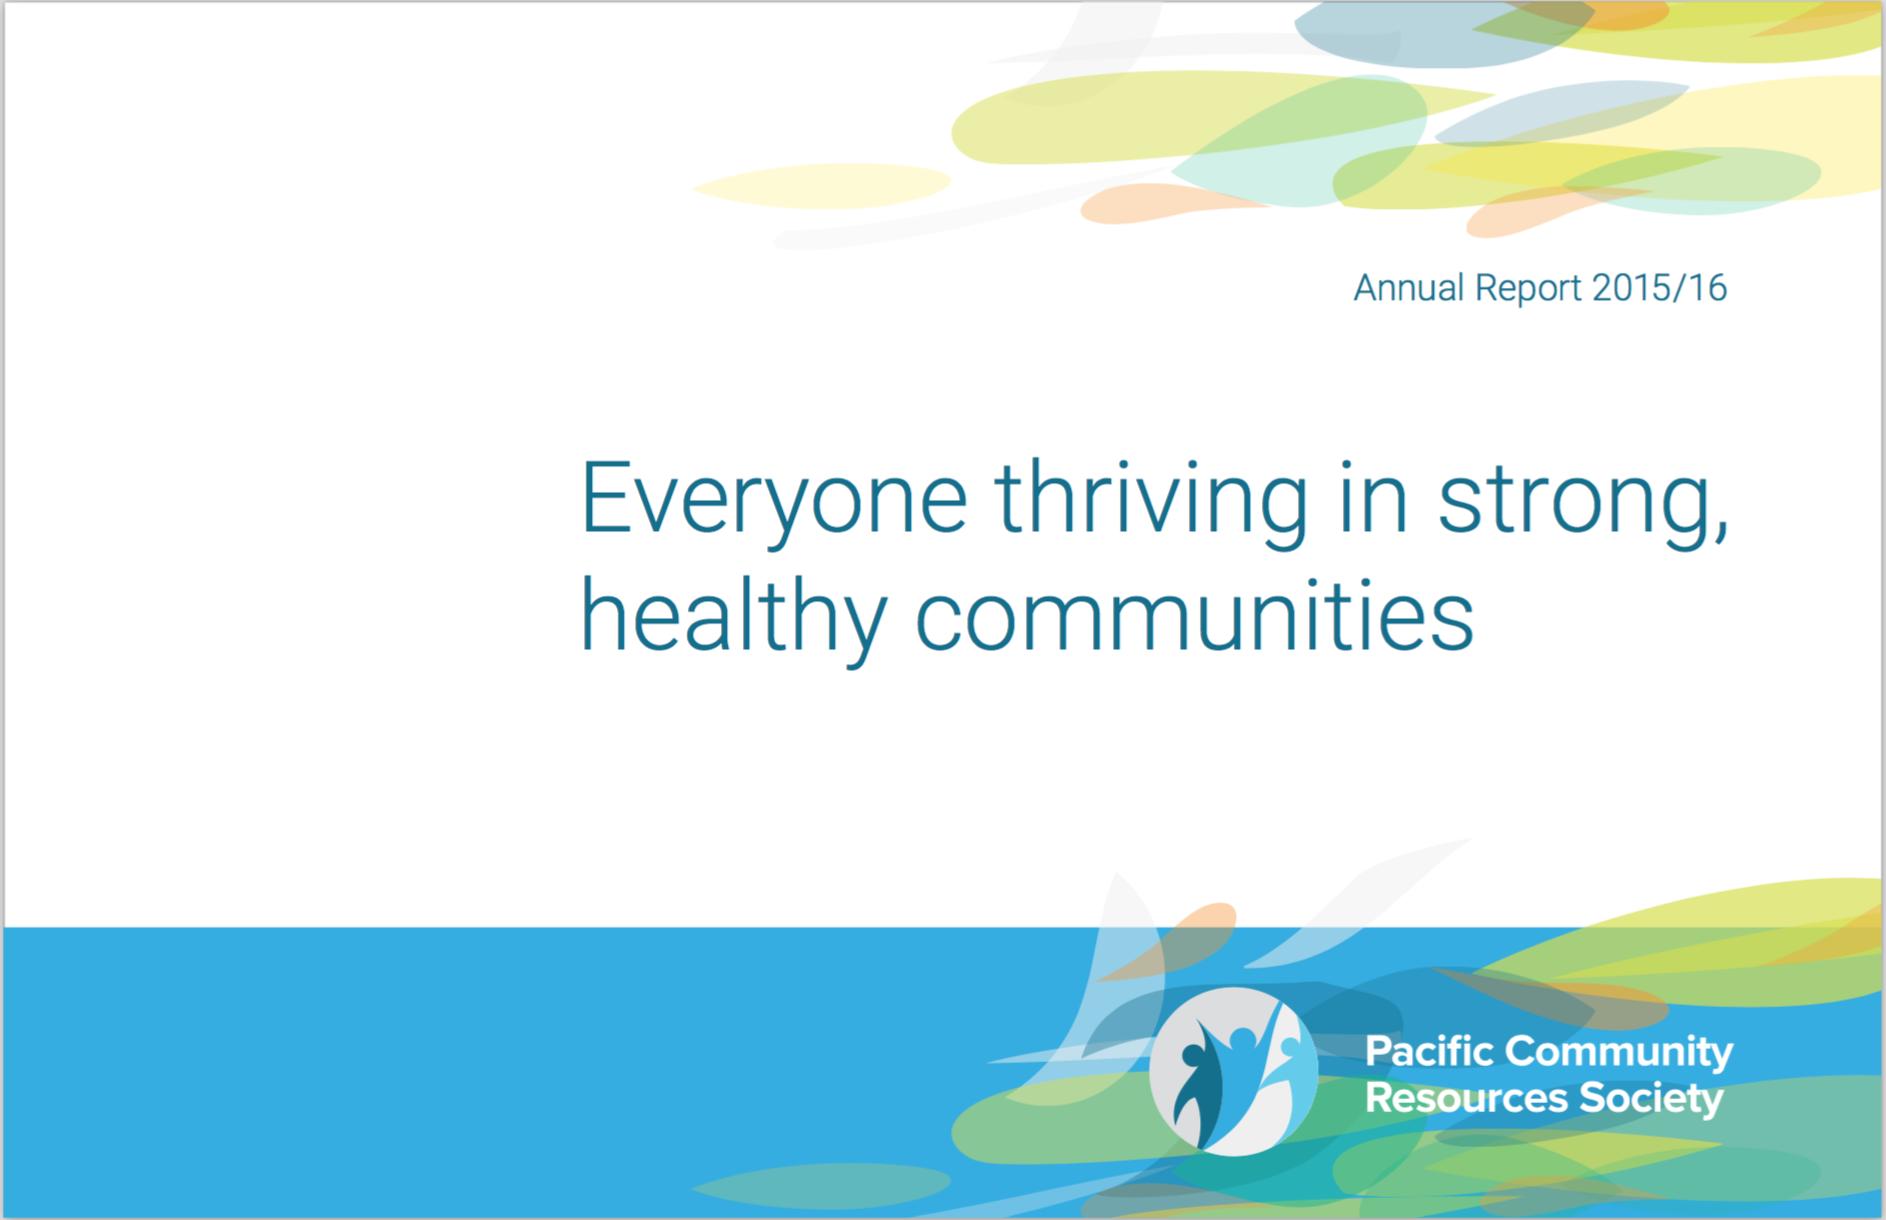 PCRS Annual Report 2015-16